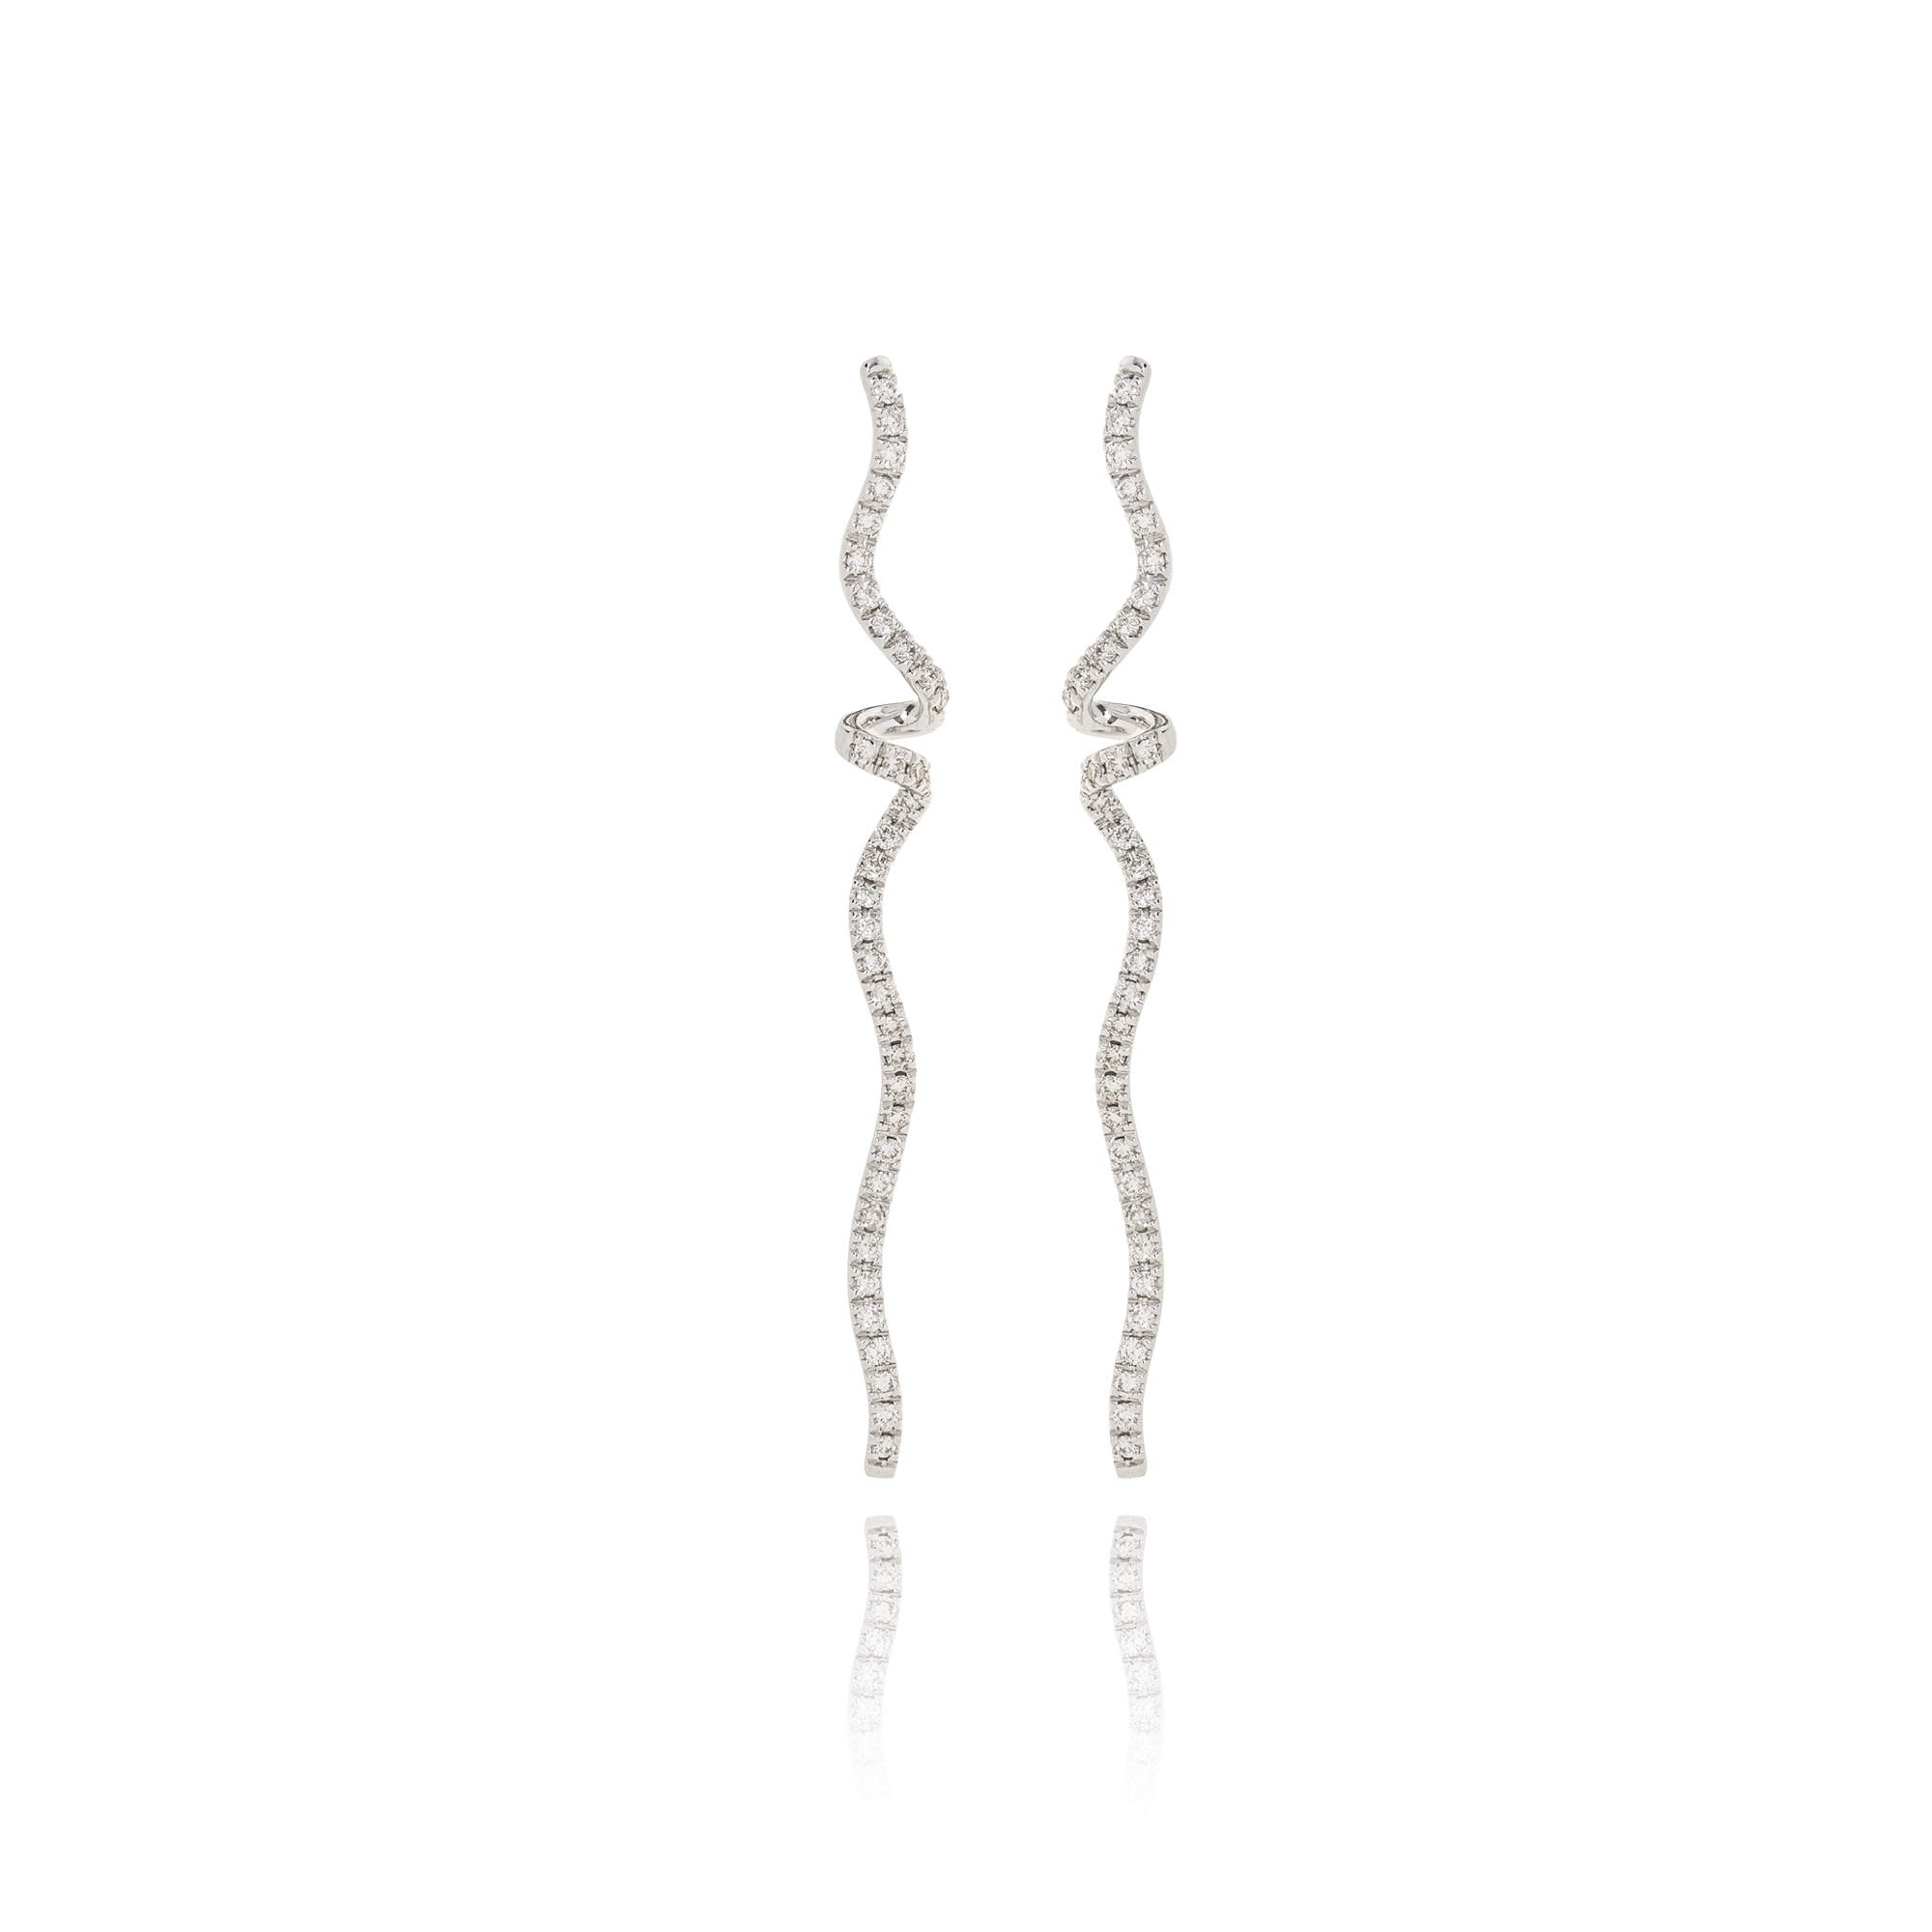 Earrings nastri white gold 18kt with diamonds